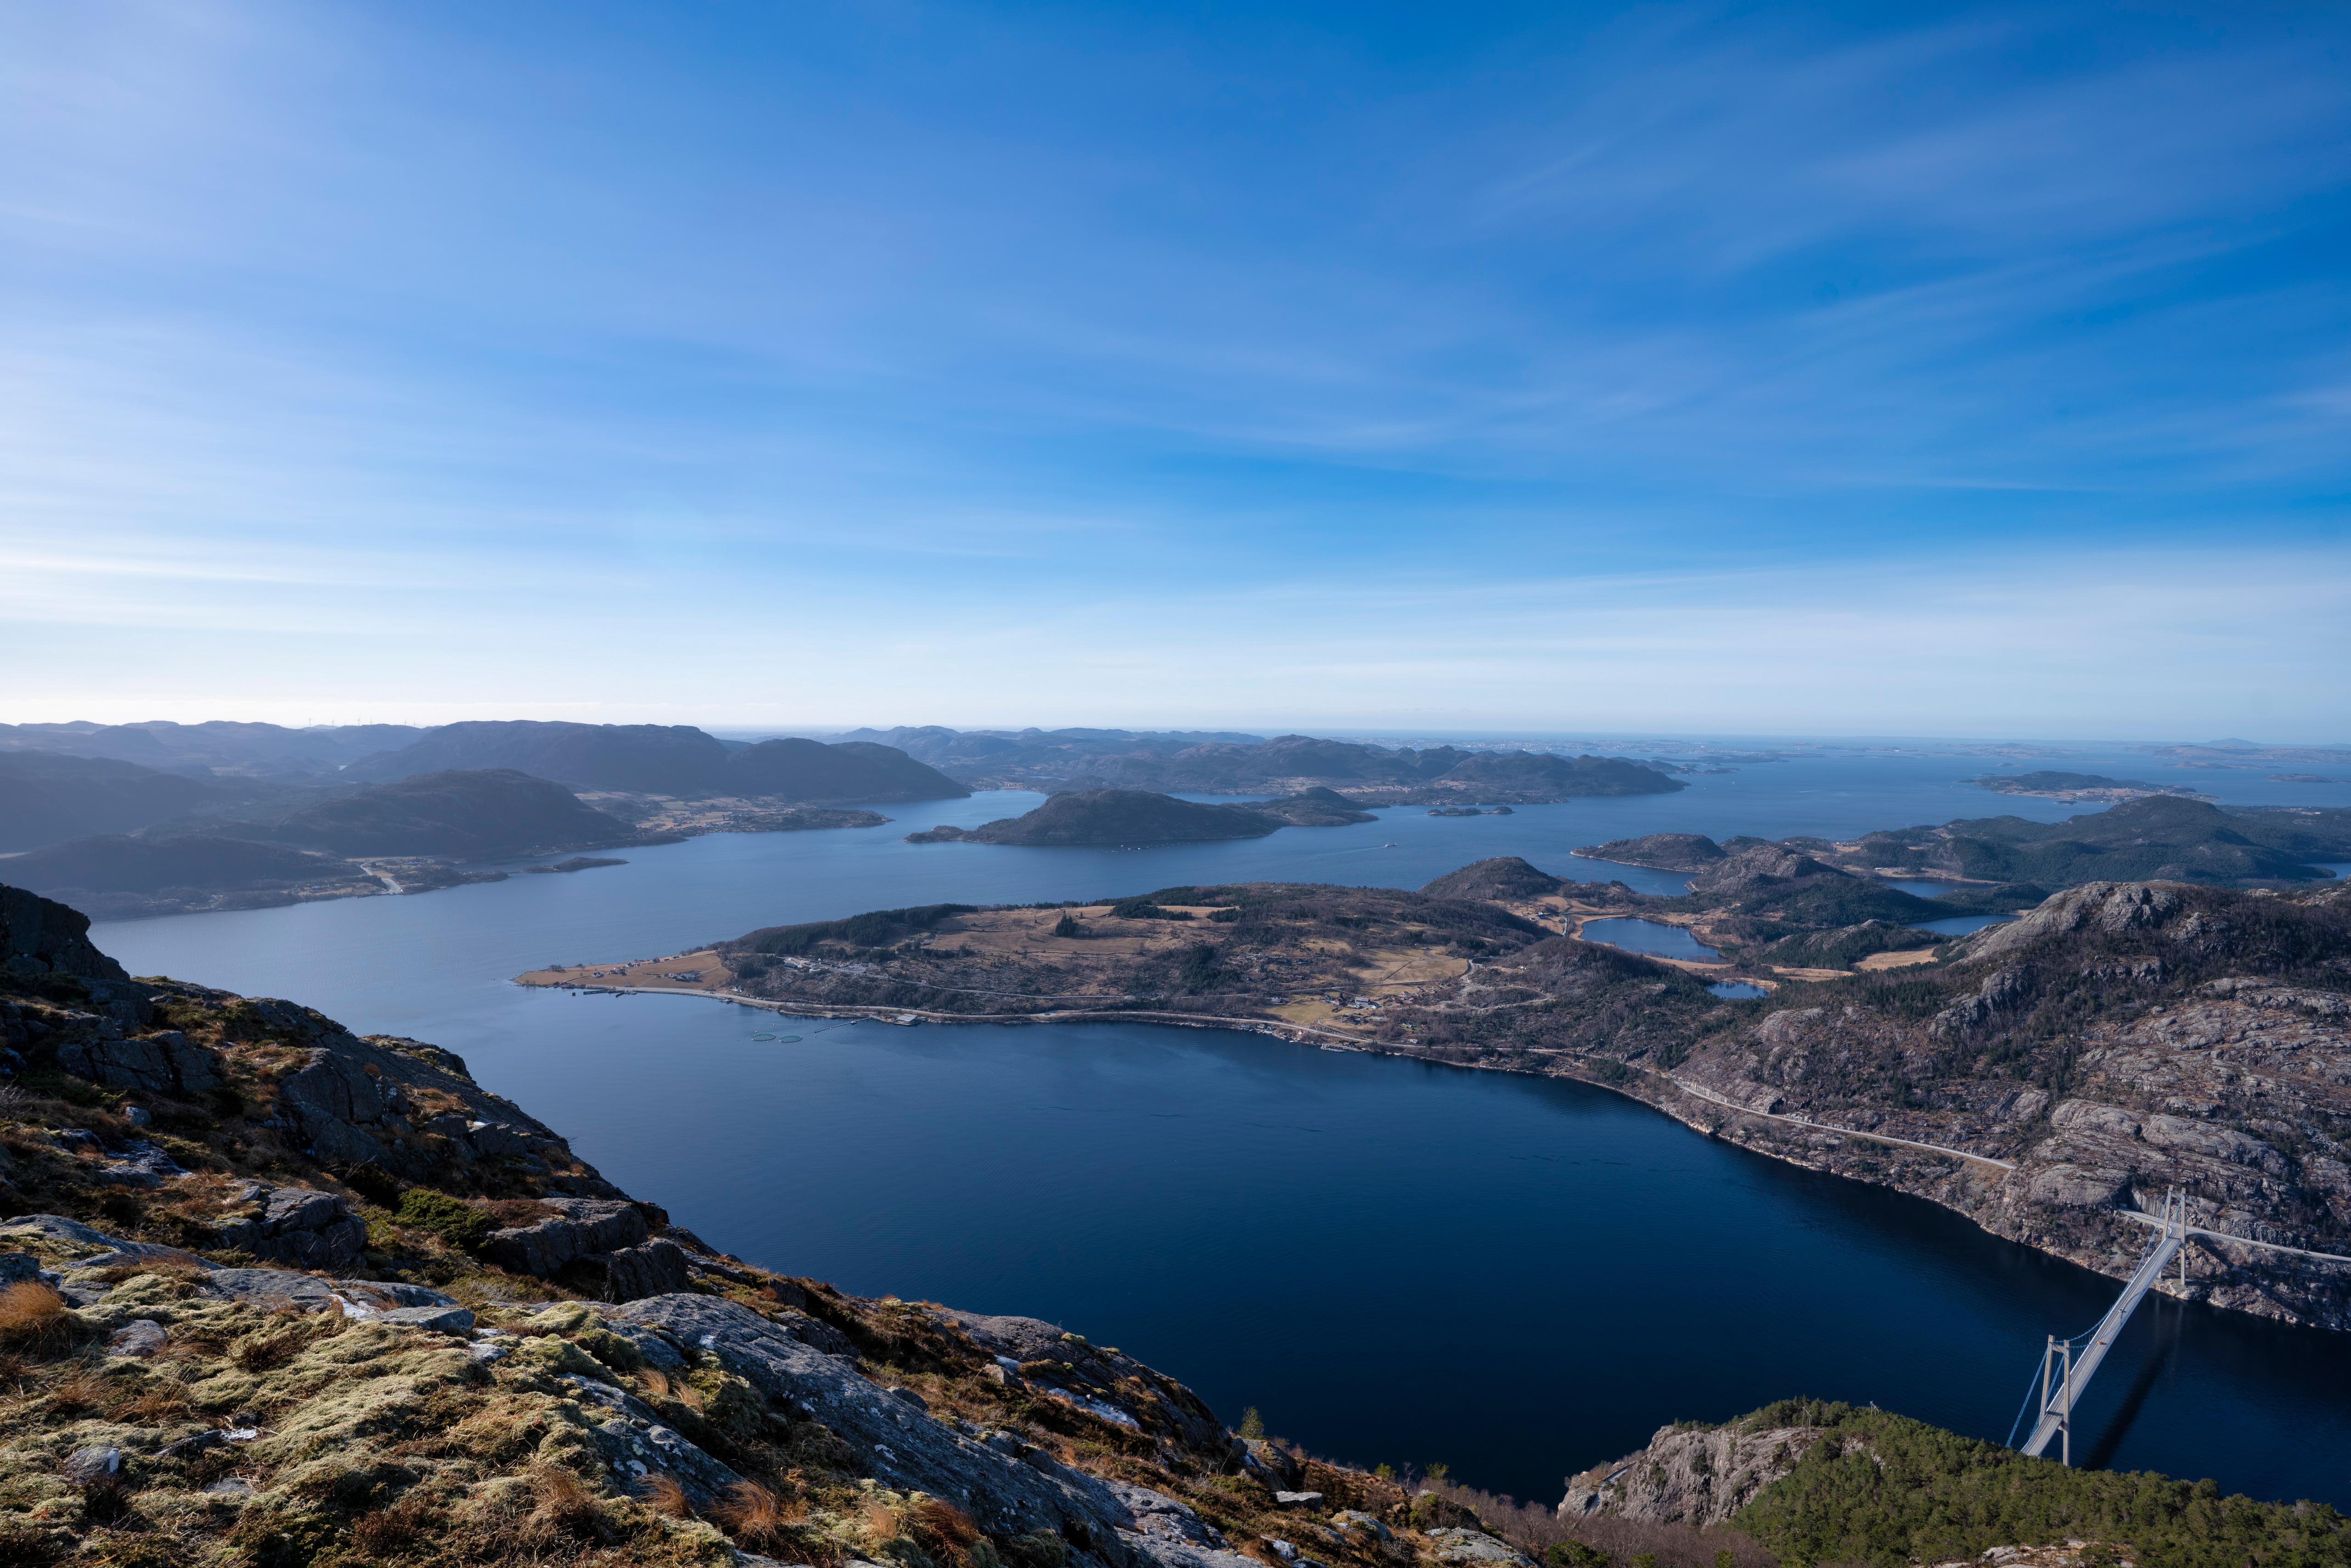 Fotos Norwegen Rogaland Fjord Natur Gebirge Himmel Von oben Berg